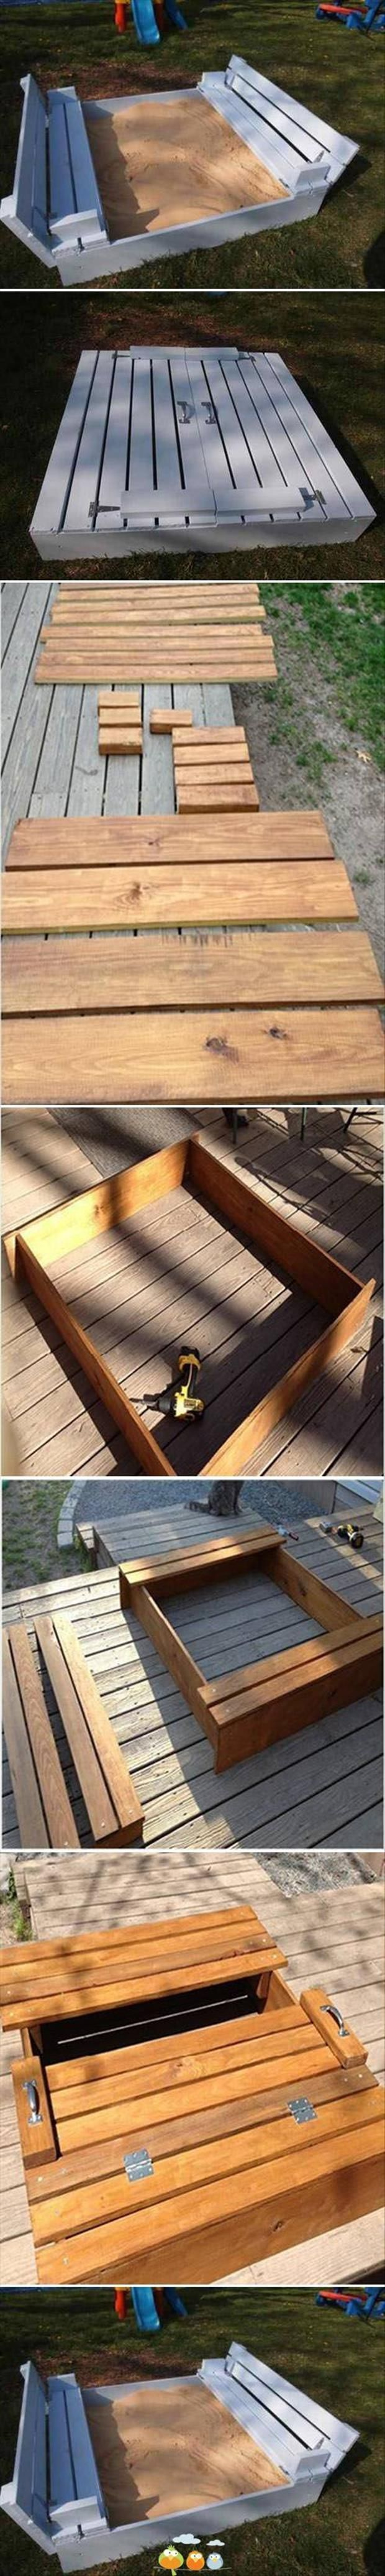 f r kinder 9 coole diy bastelideen mit holzpaletten pinterest holzpaletten. Black Bedroom Furniture Sets. Home Design Ideas